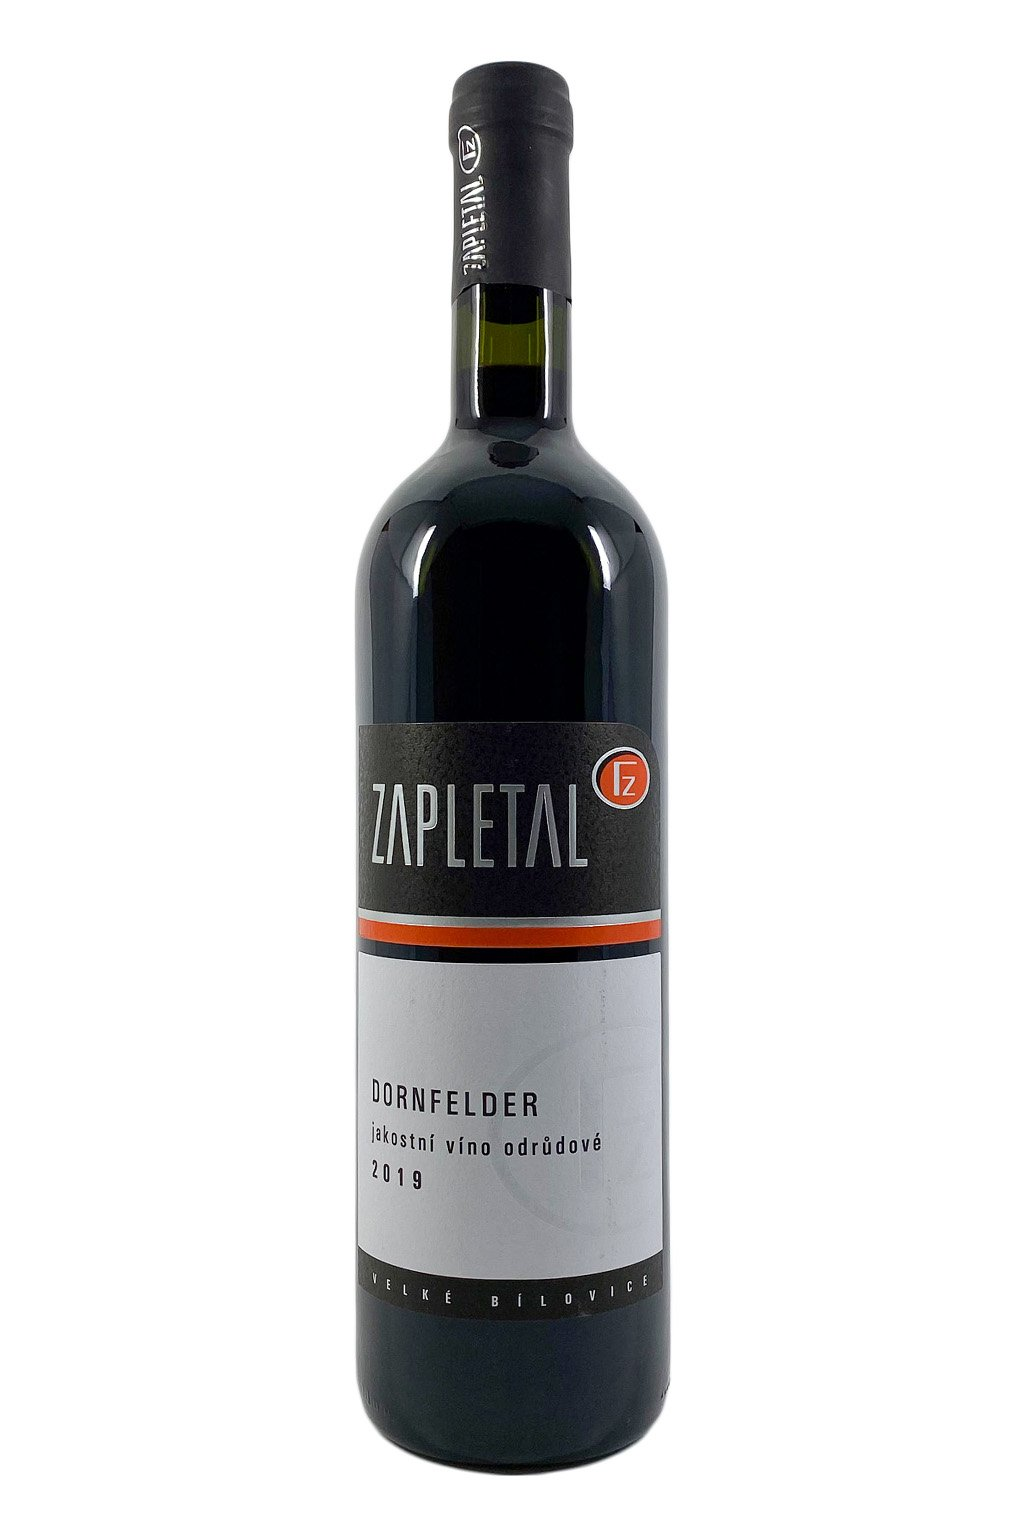 vinoadestilaty 0098 Vrstva 11